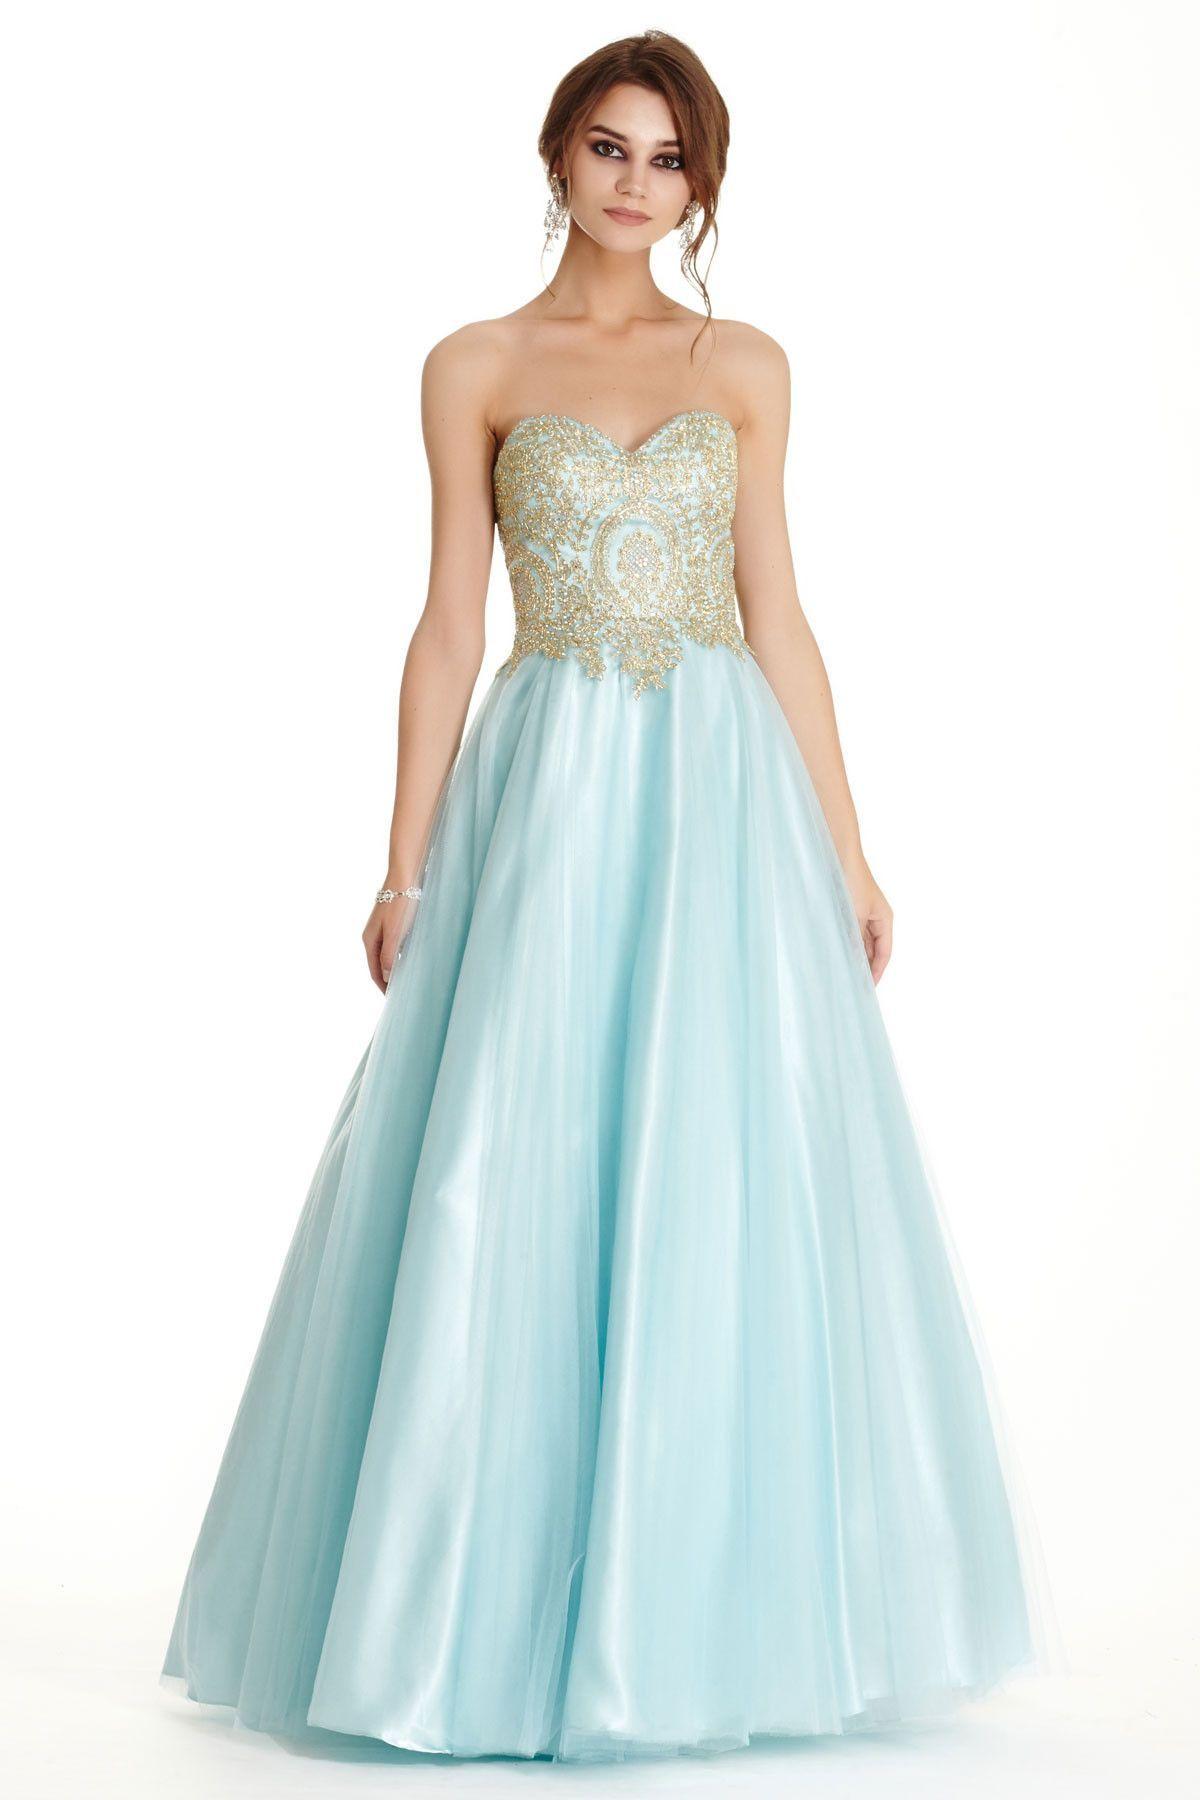 Exelent Bustier Wedding Gowns Crest - All Wedding Dresses ...